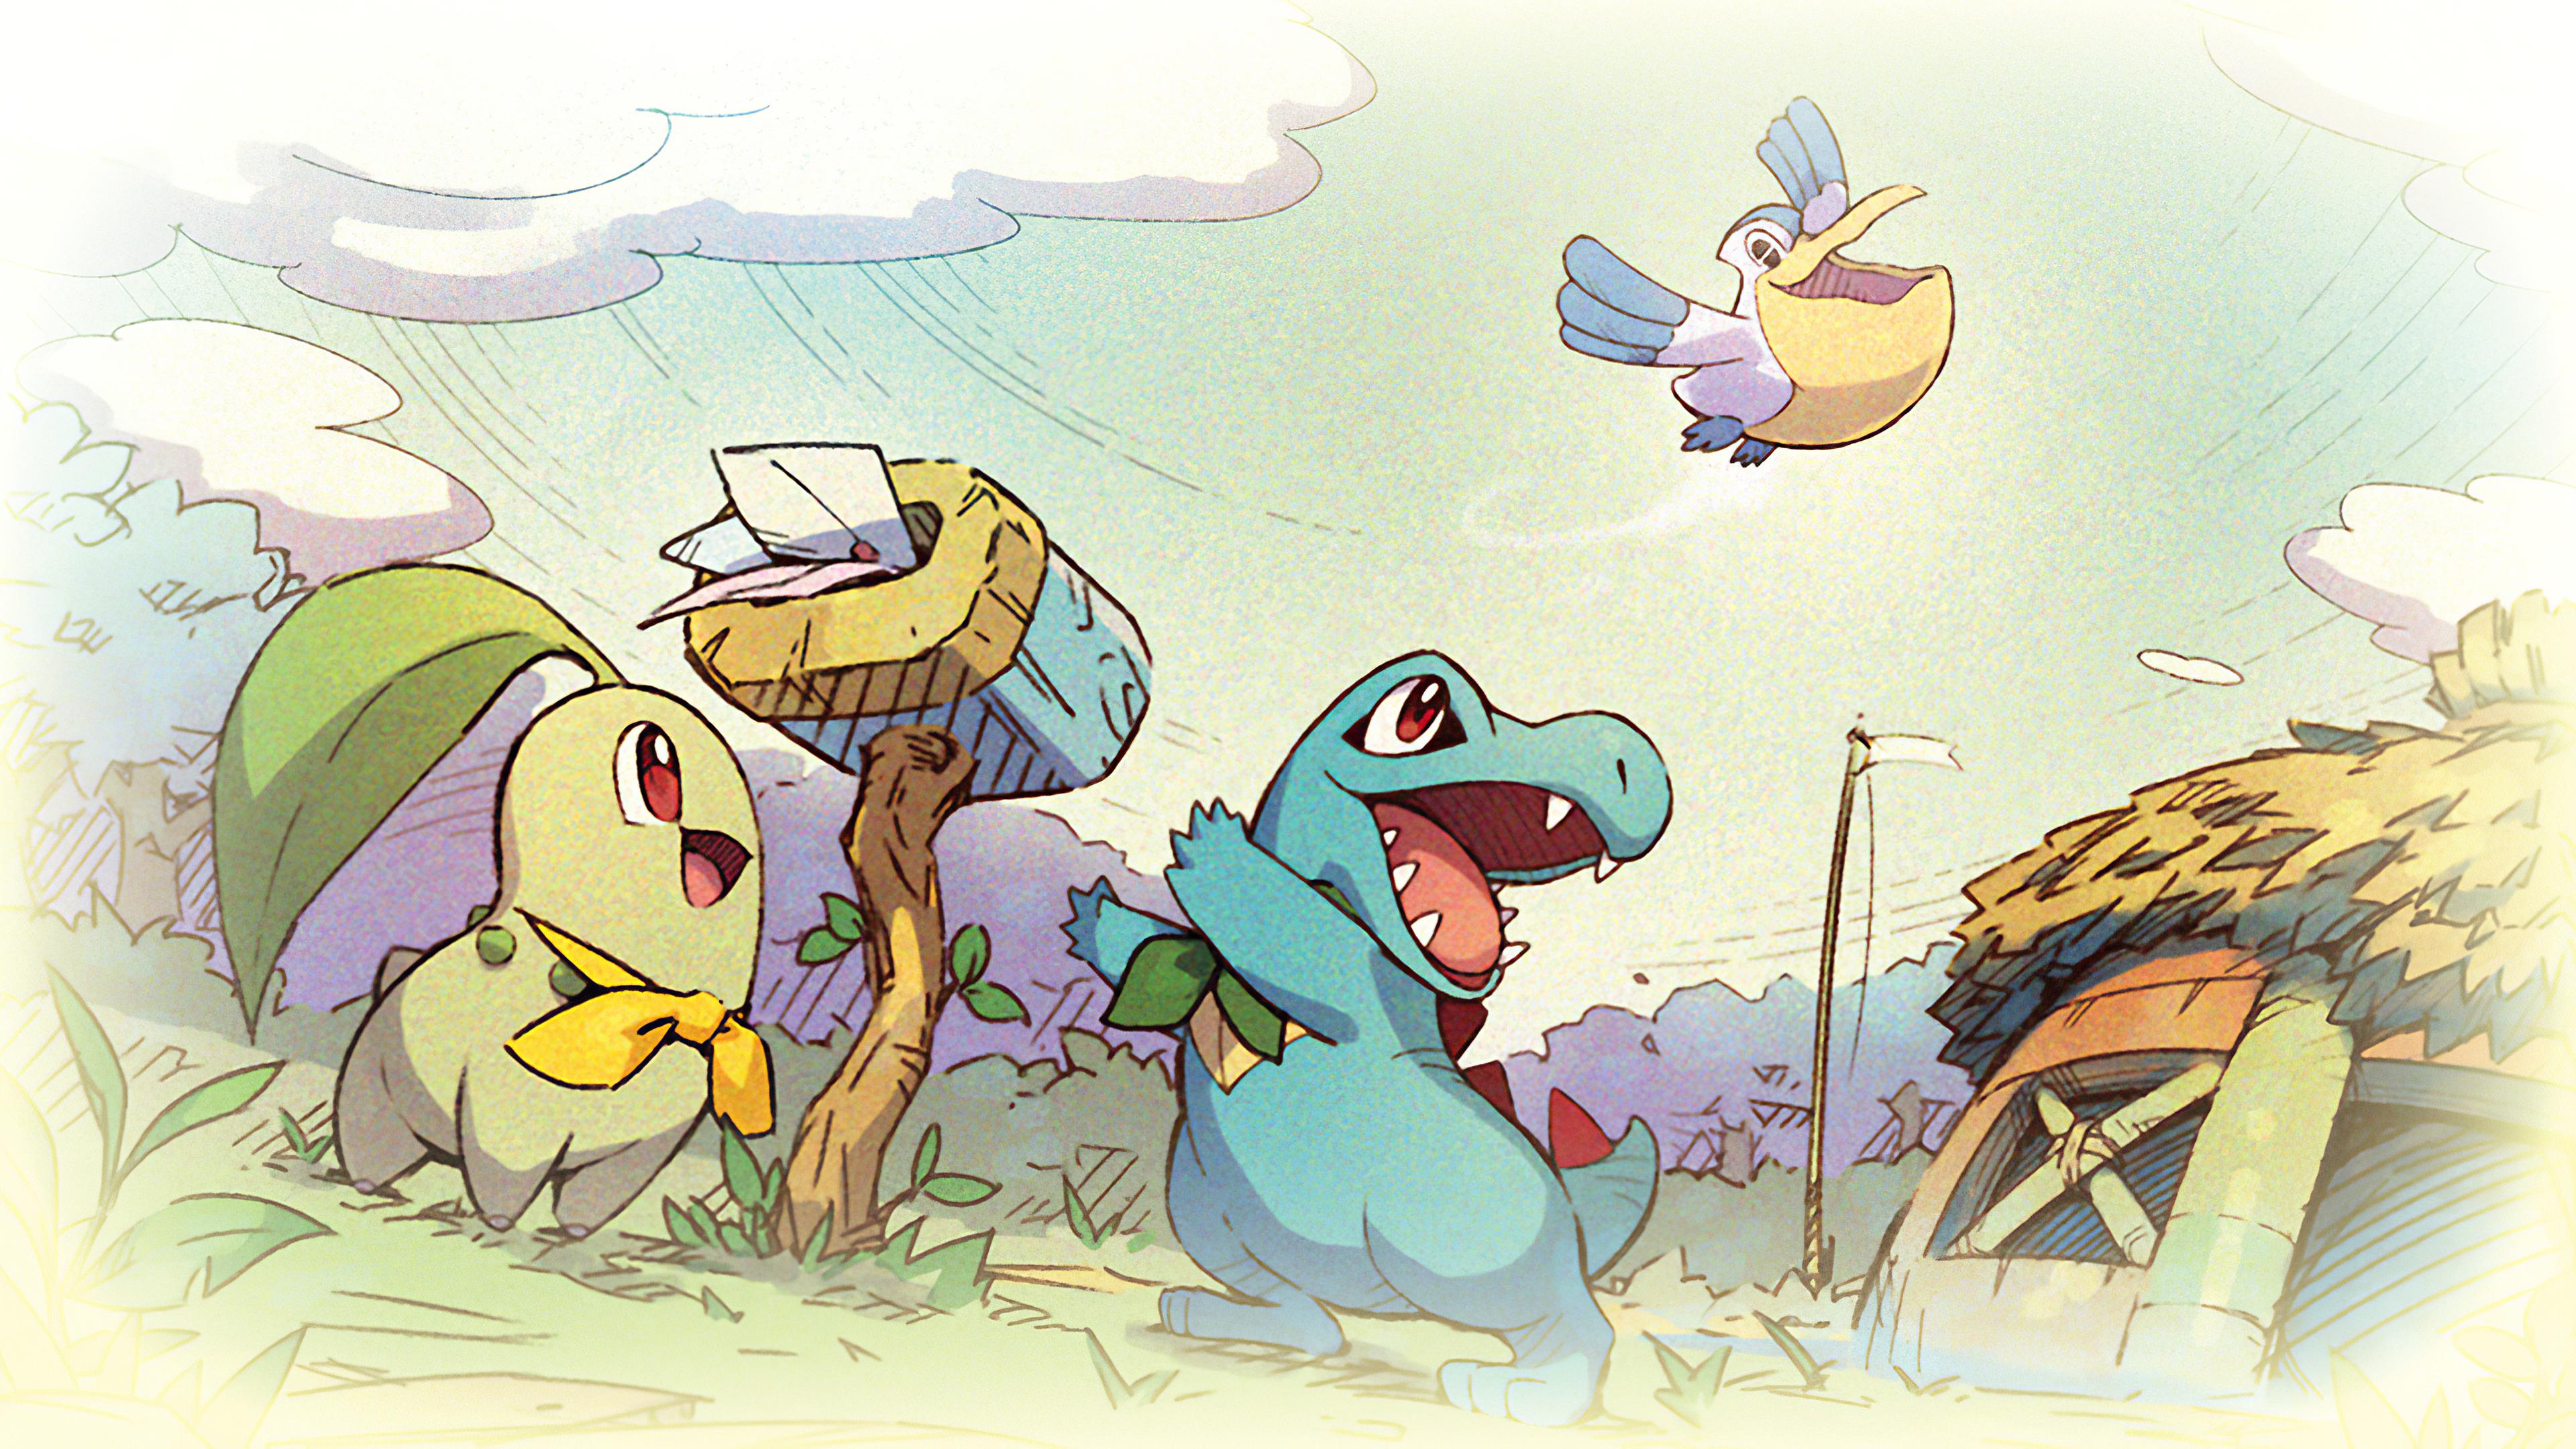 pokemon mystery dungeon 1581275836 - Pokemon Mystery Dungeon - 2020 Pokemon Mystery Dungeon wallpapers, 2020 Pokemon Mystery Dungeon 4k wallpapers